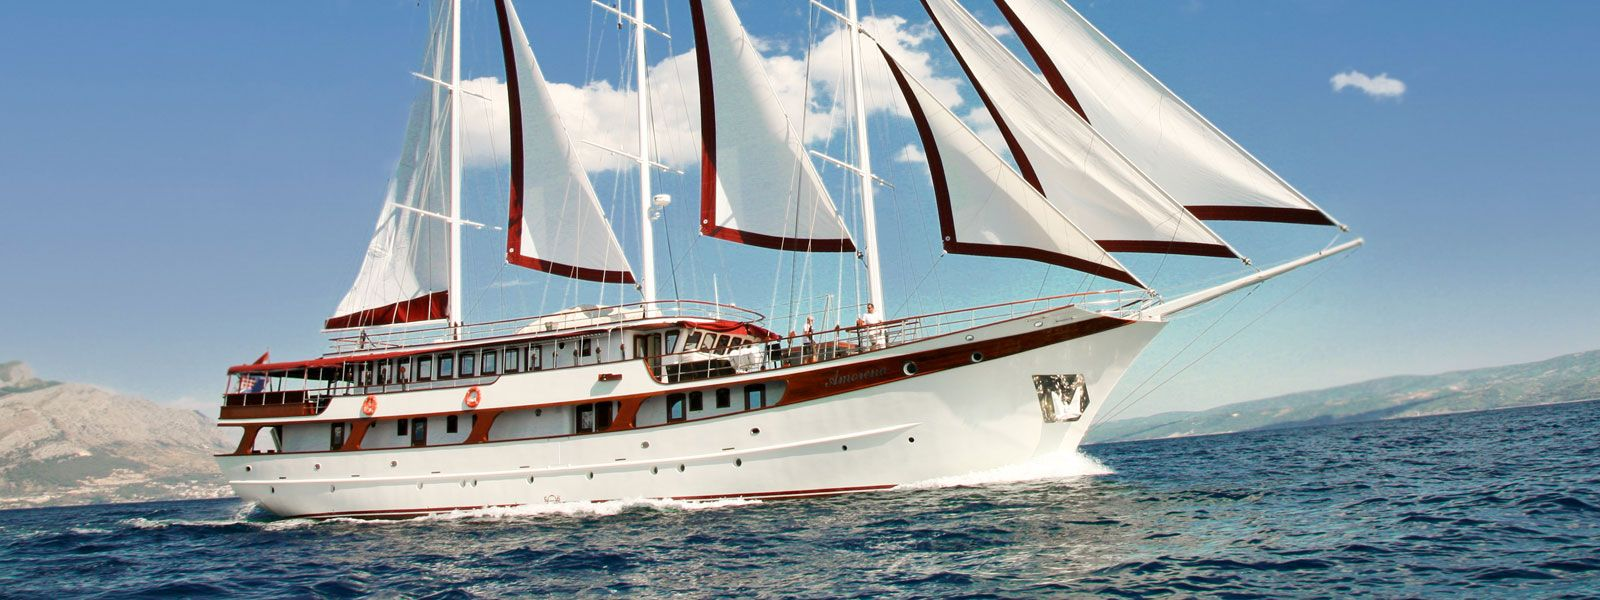 Yacht Amorena - Mini cruiser